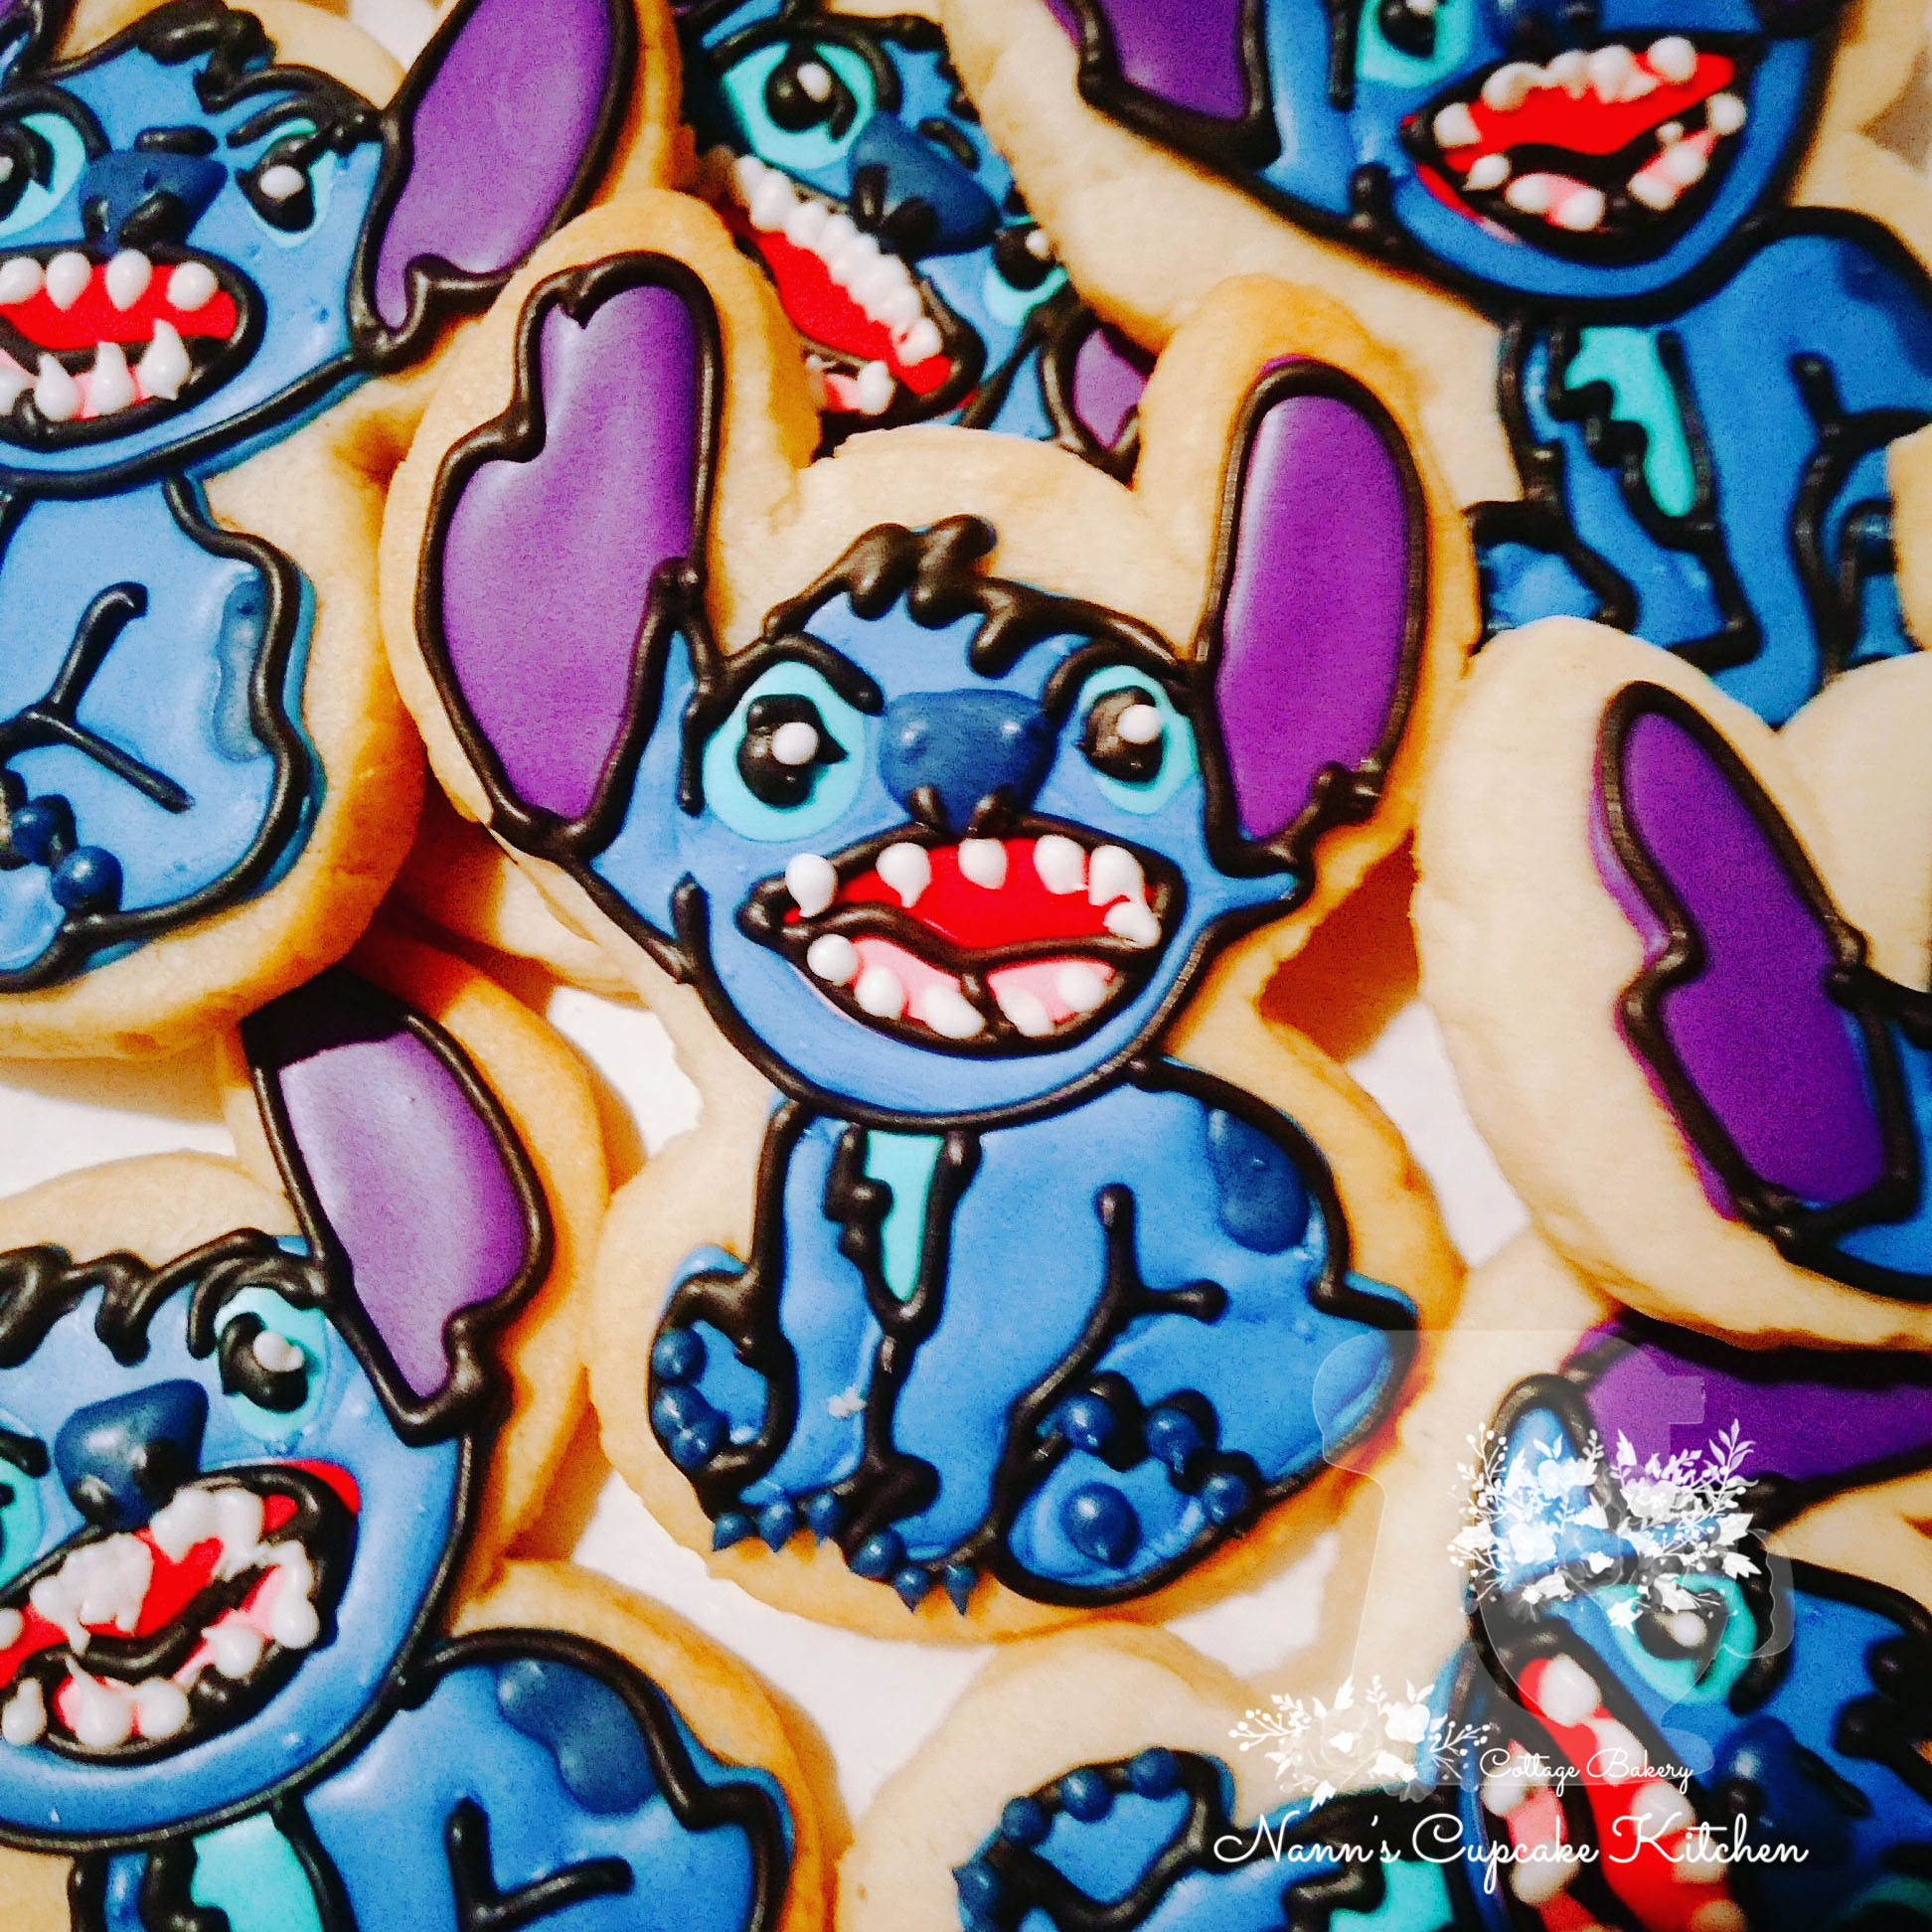 Stich Cookies